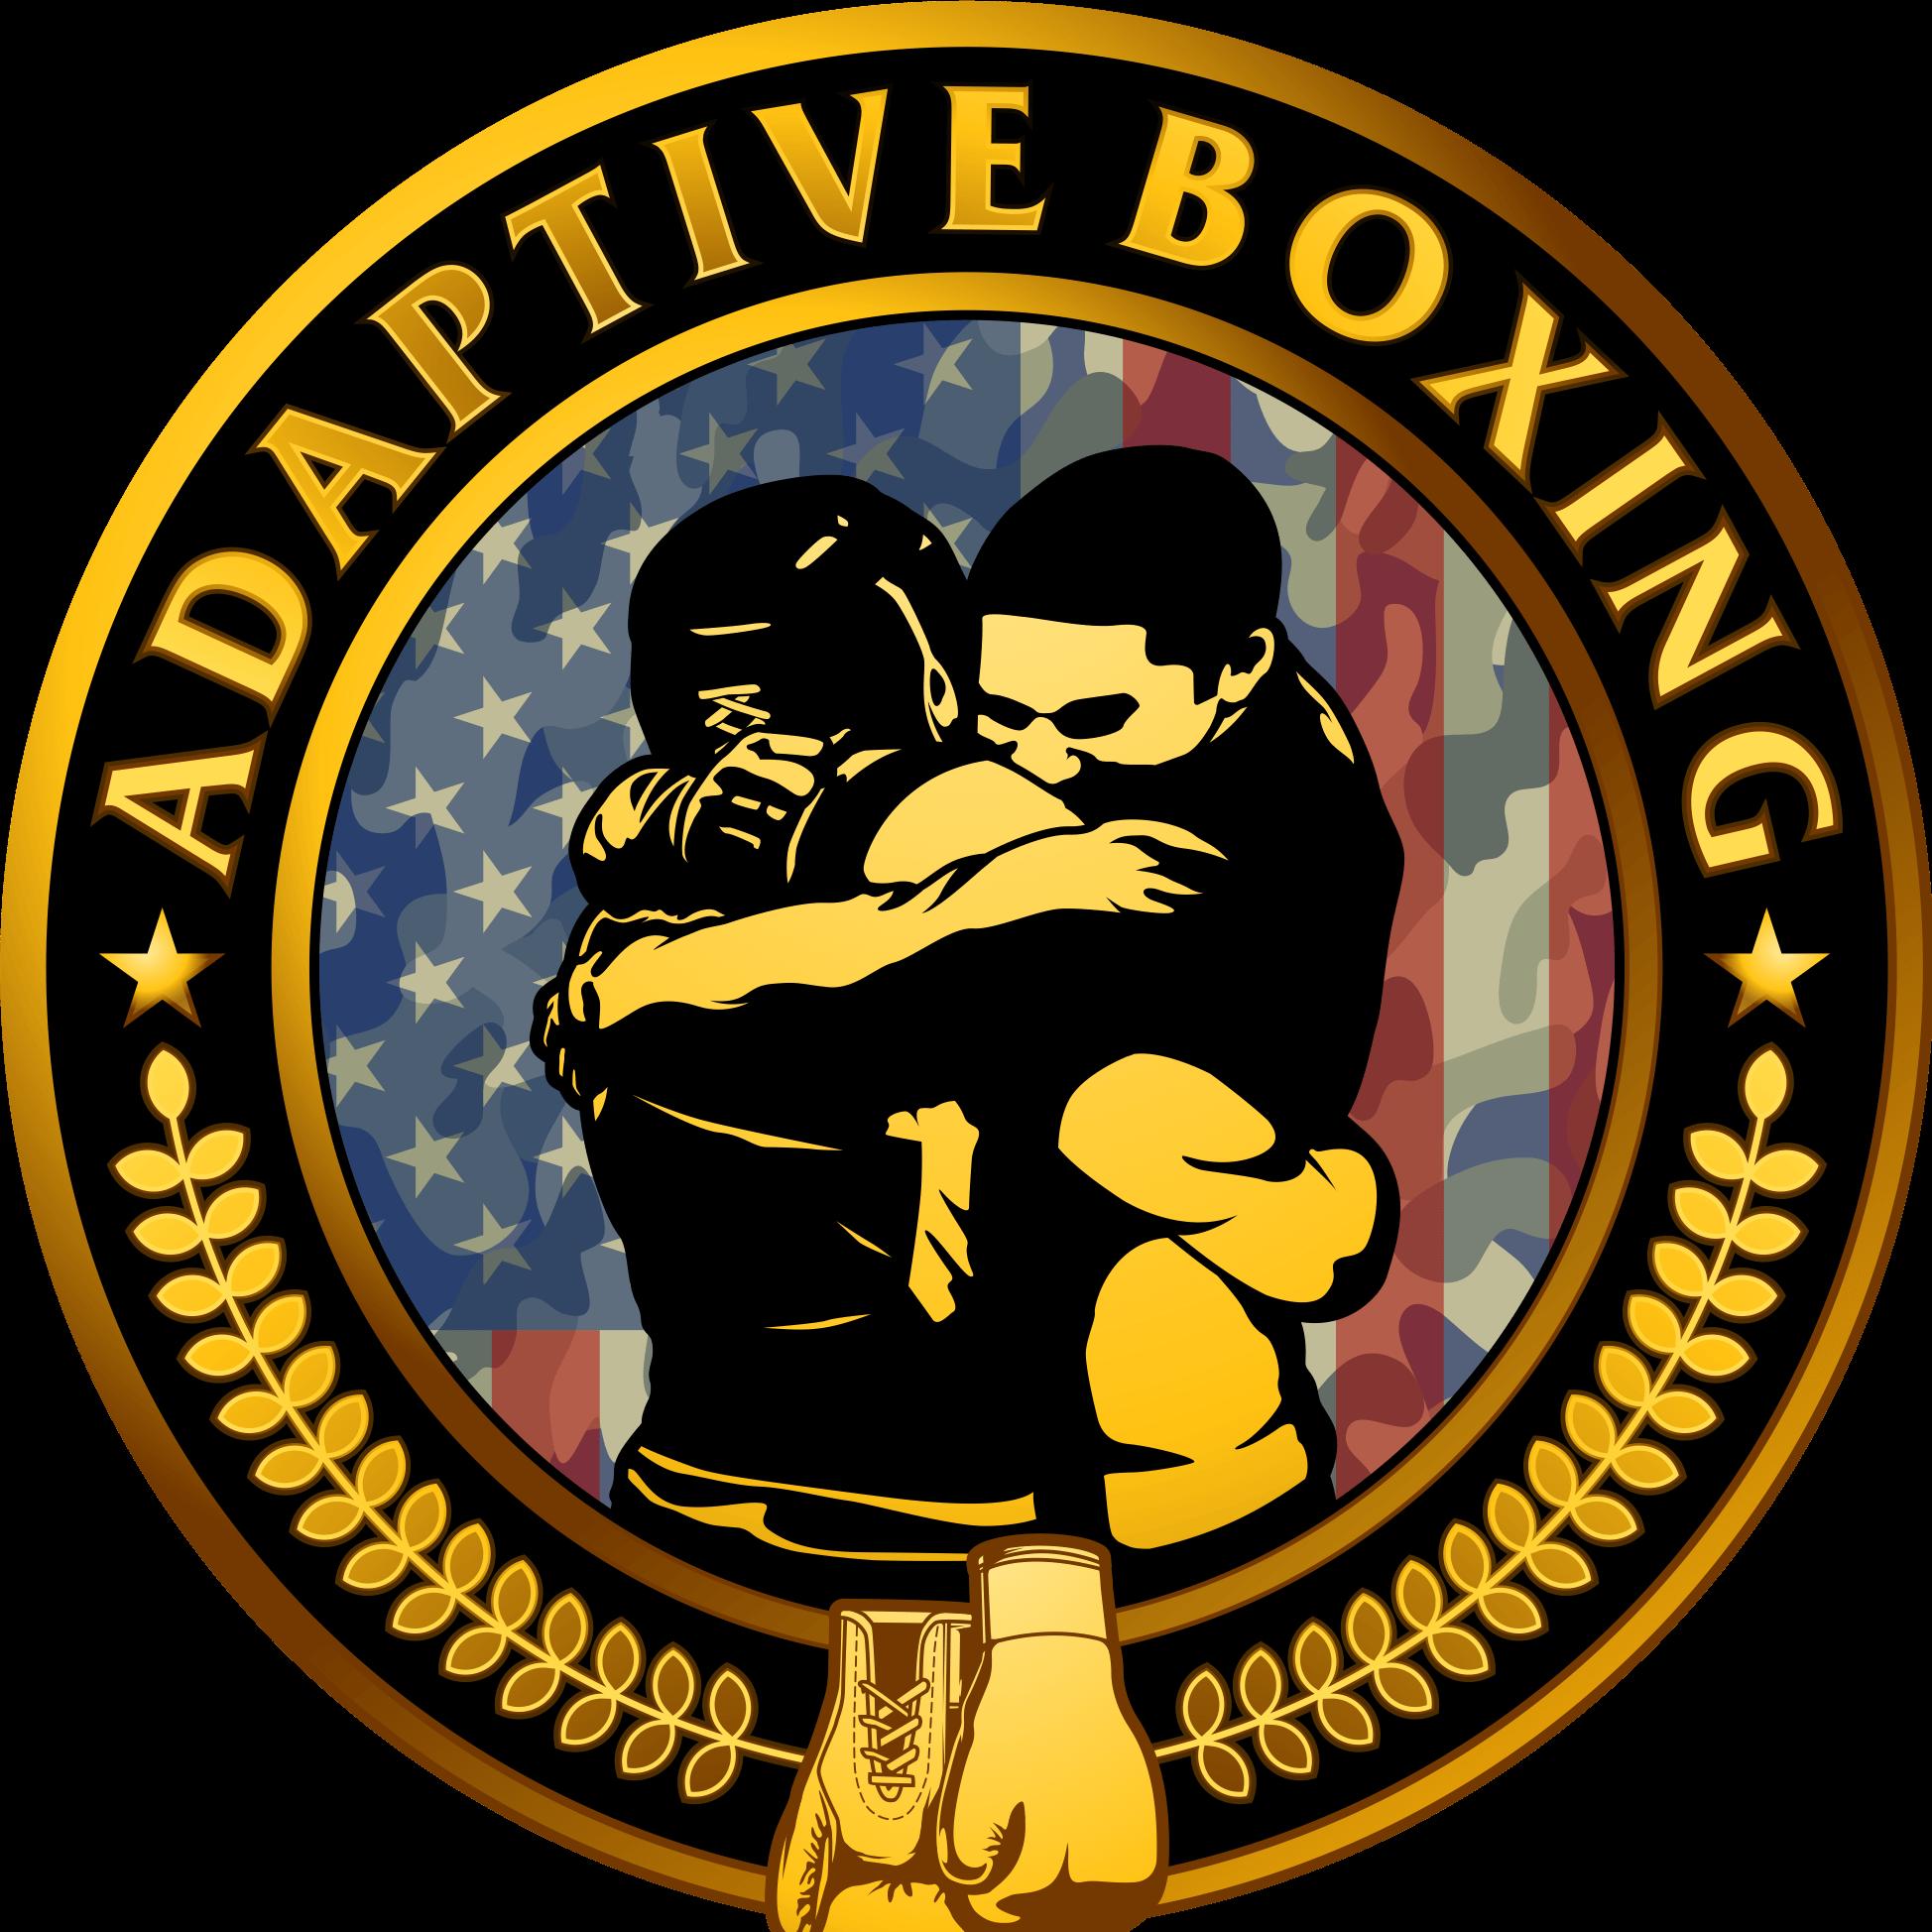 Adaptive Boxing & Training Club